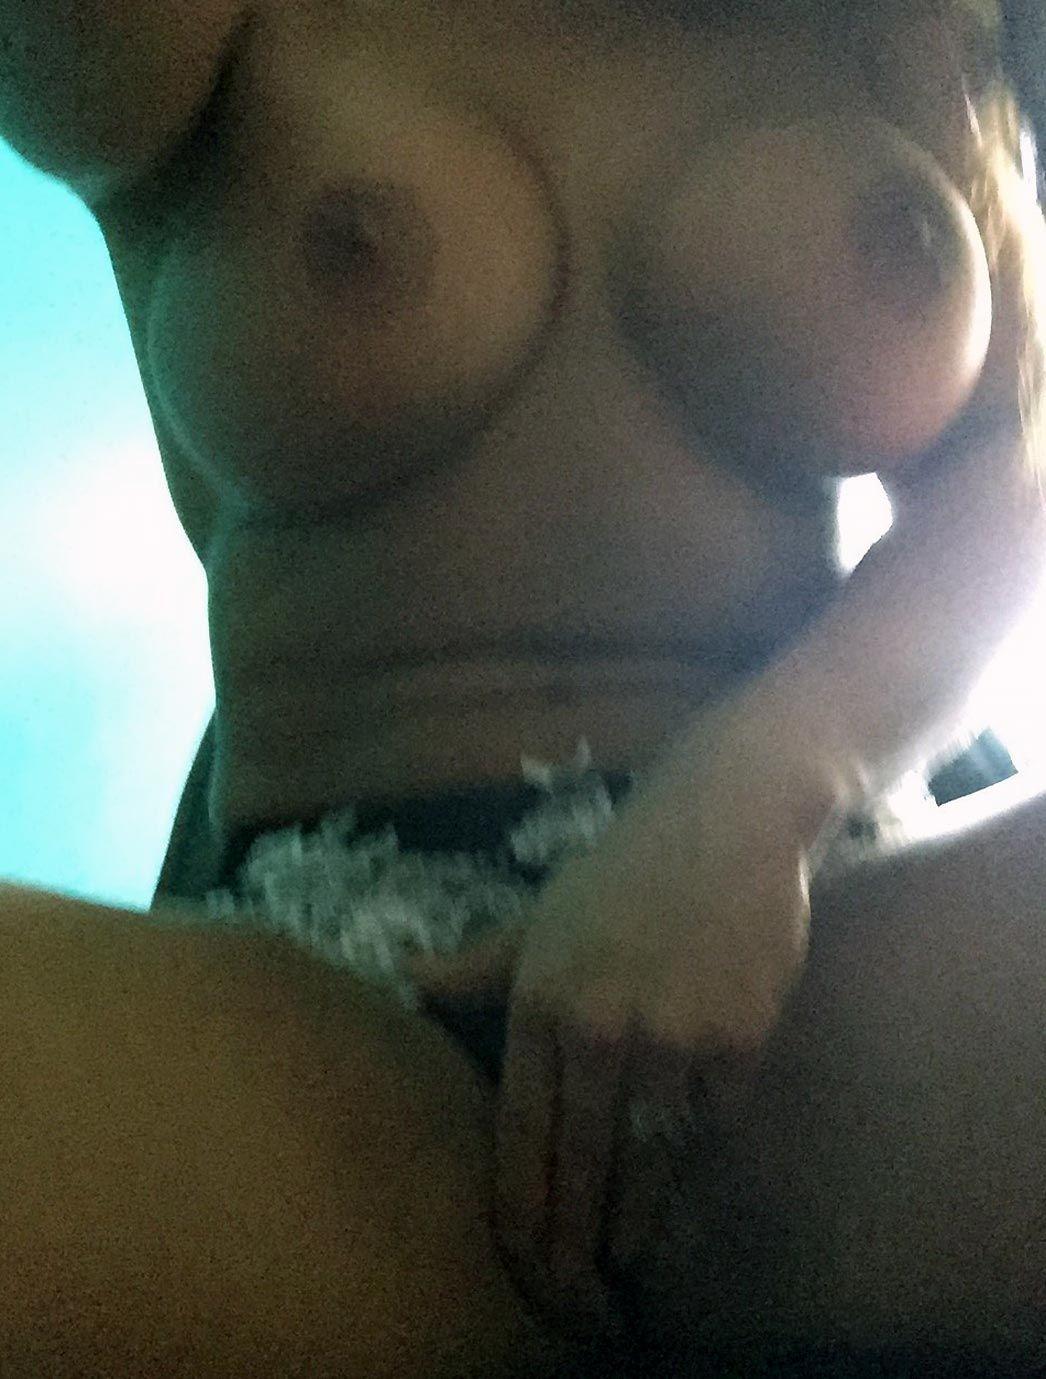 Celeste Bonin Nude Leaked The Fappening & Sexy 0314